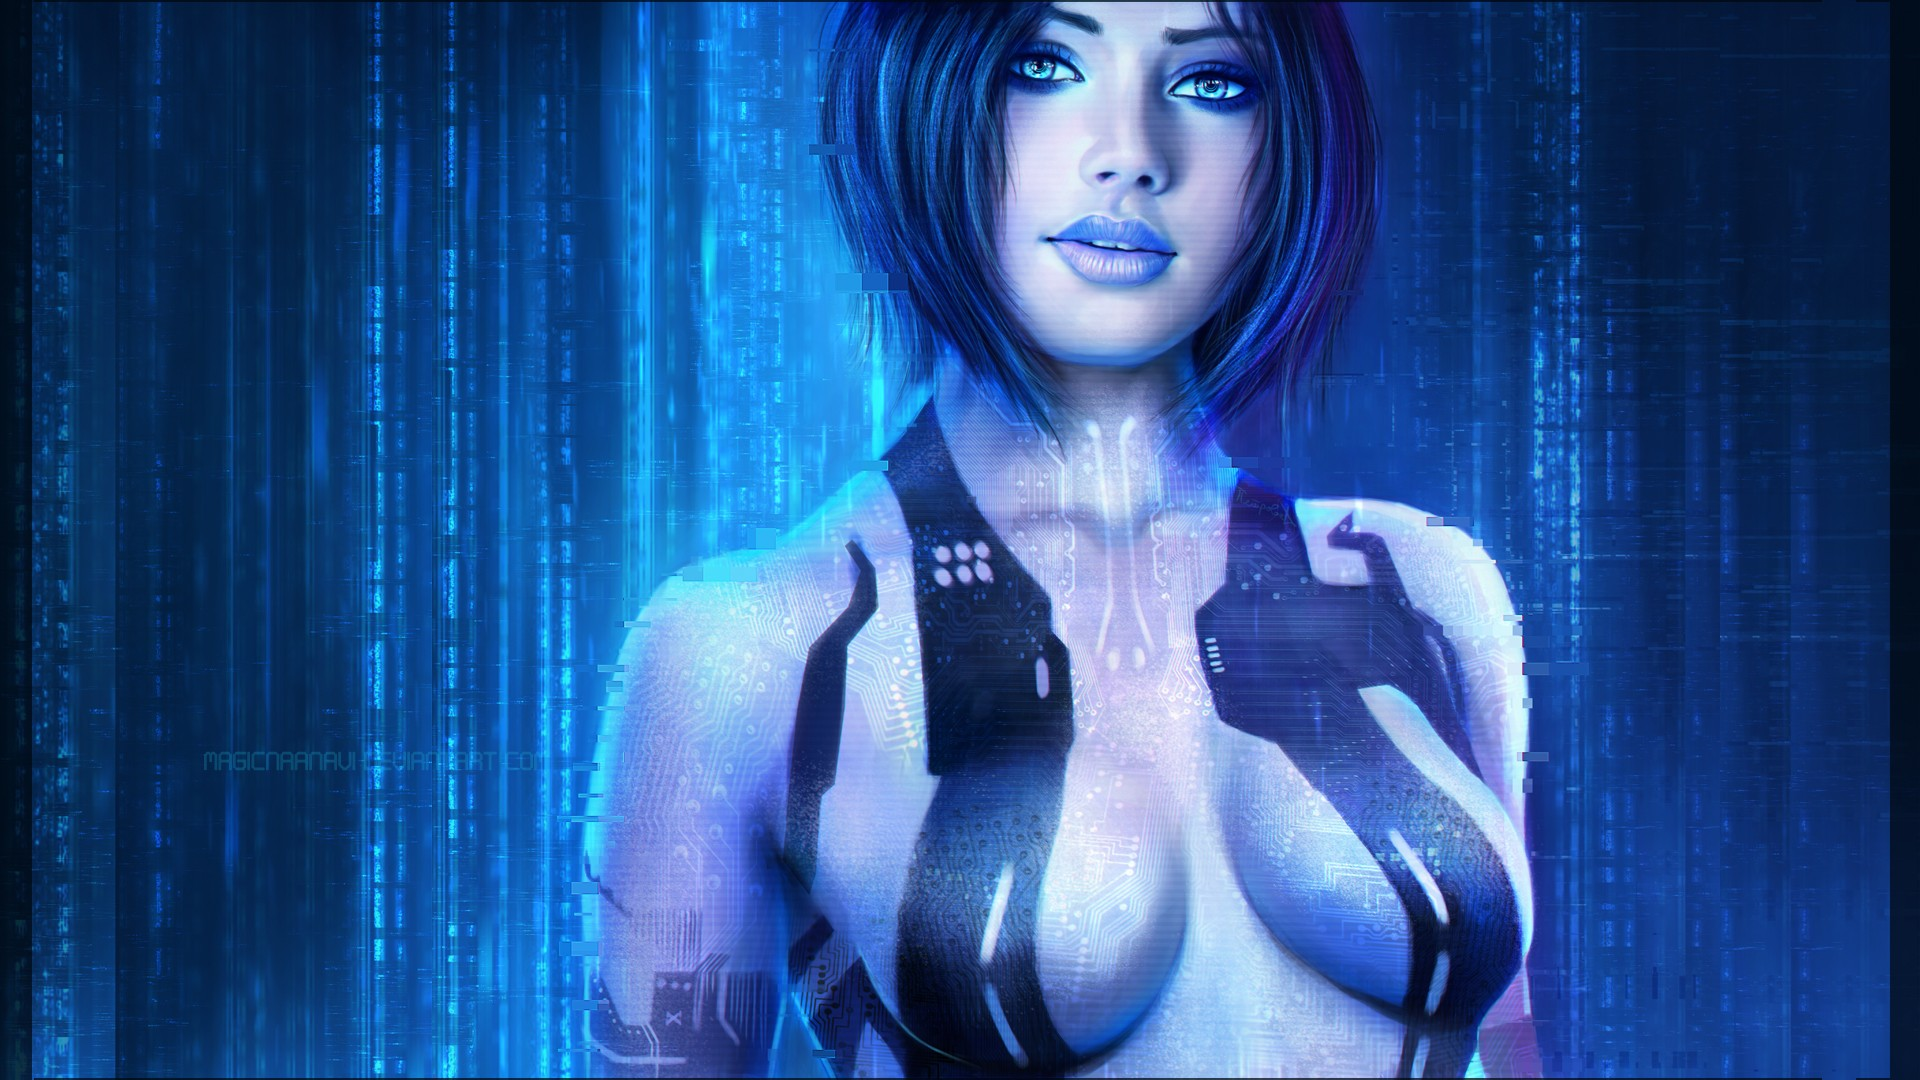 Cortana sex sim game sex images